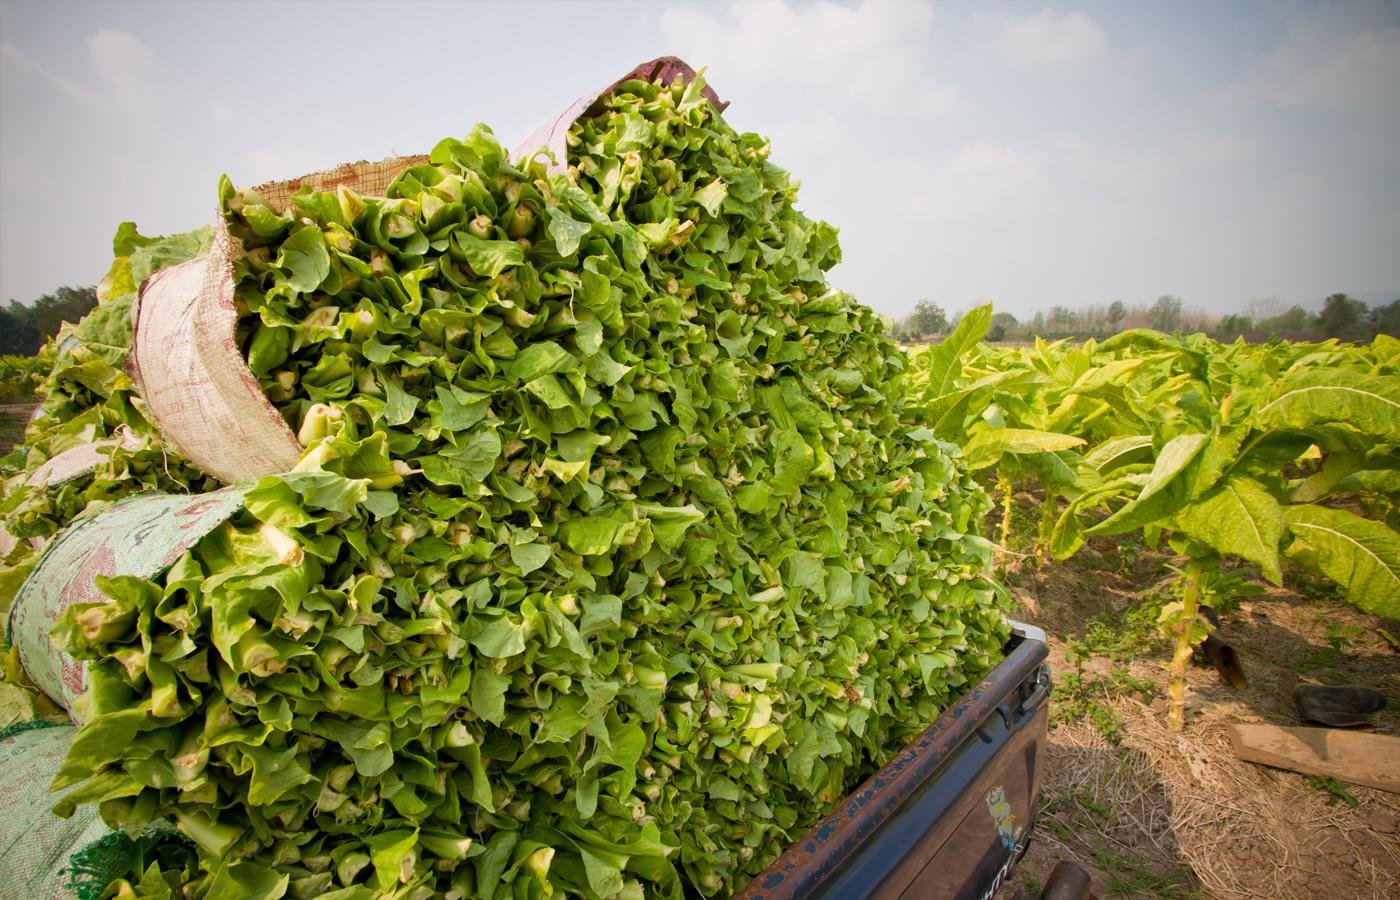 2. Harvesting